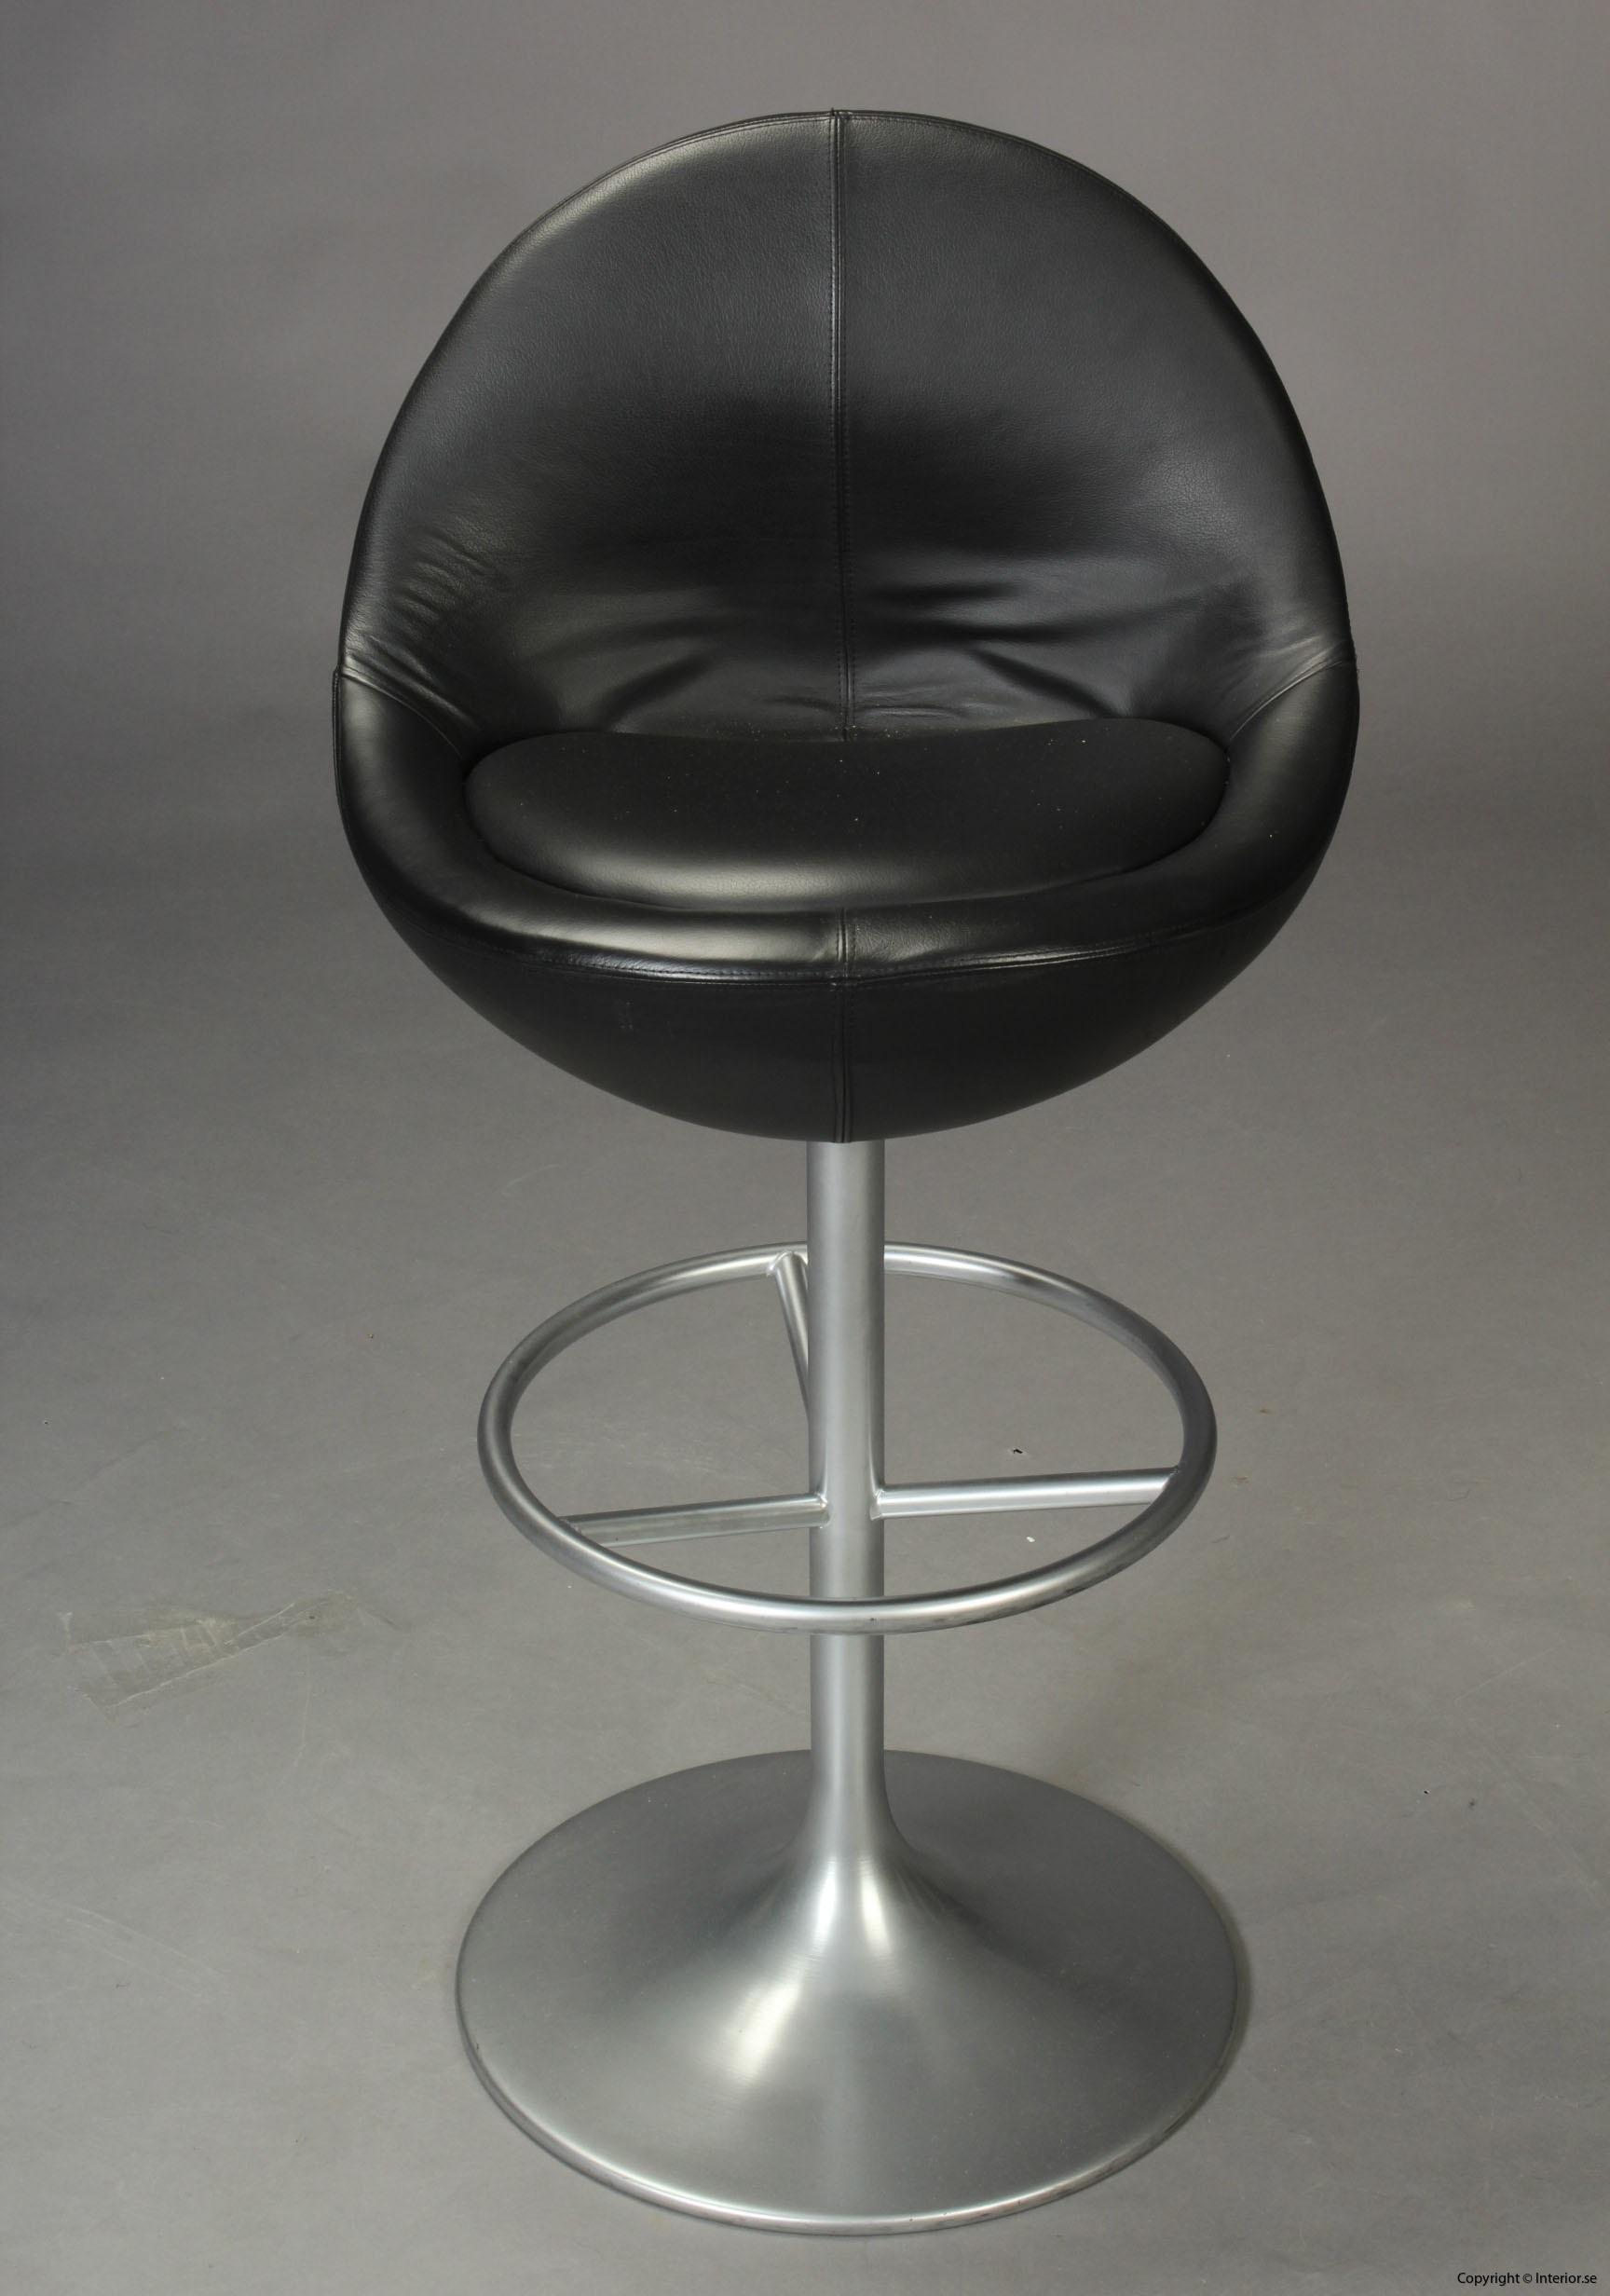 1 Johanson Design venus barstol (6)